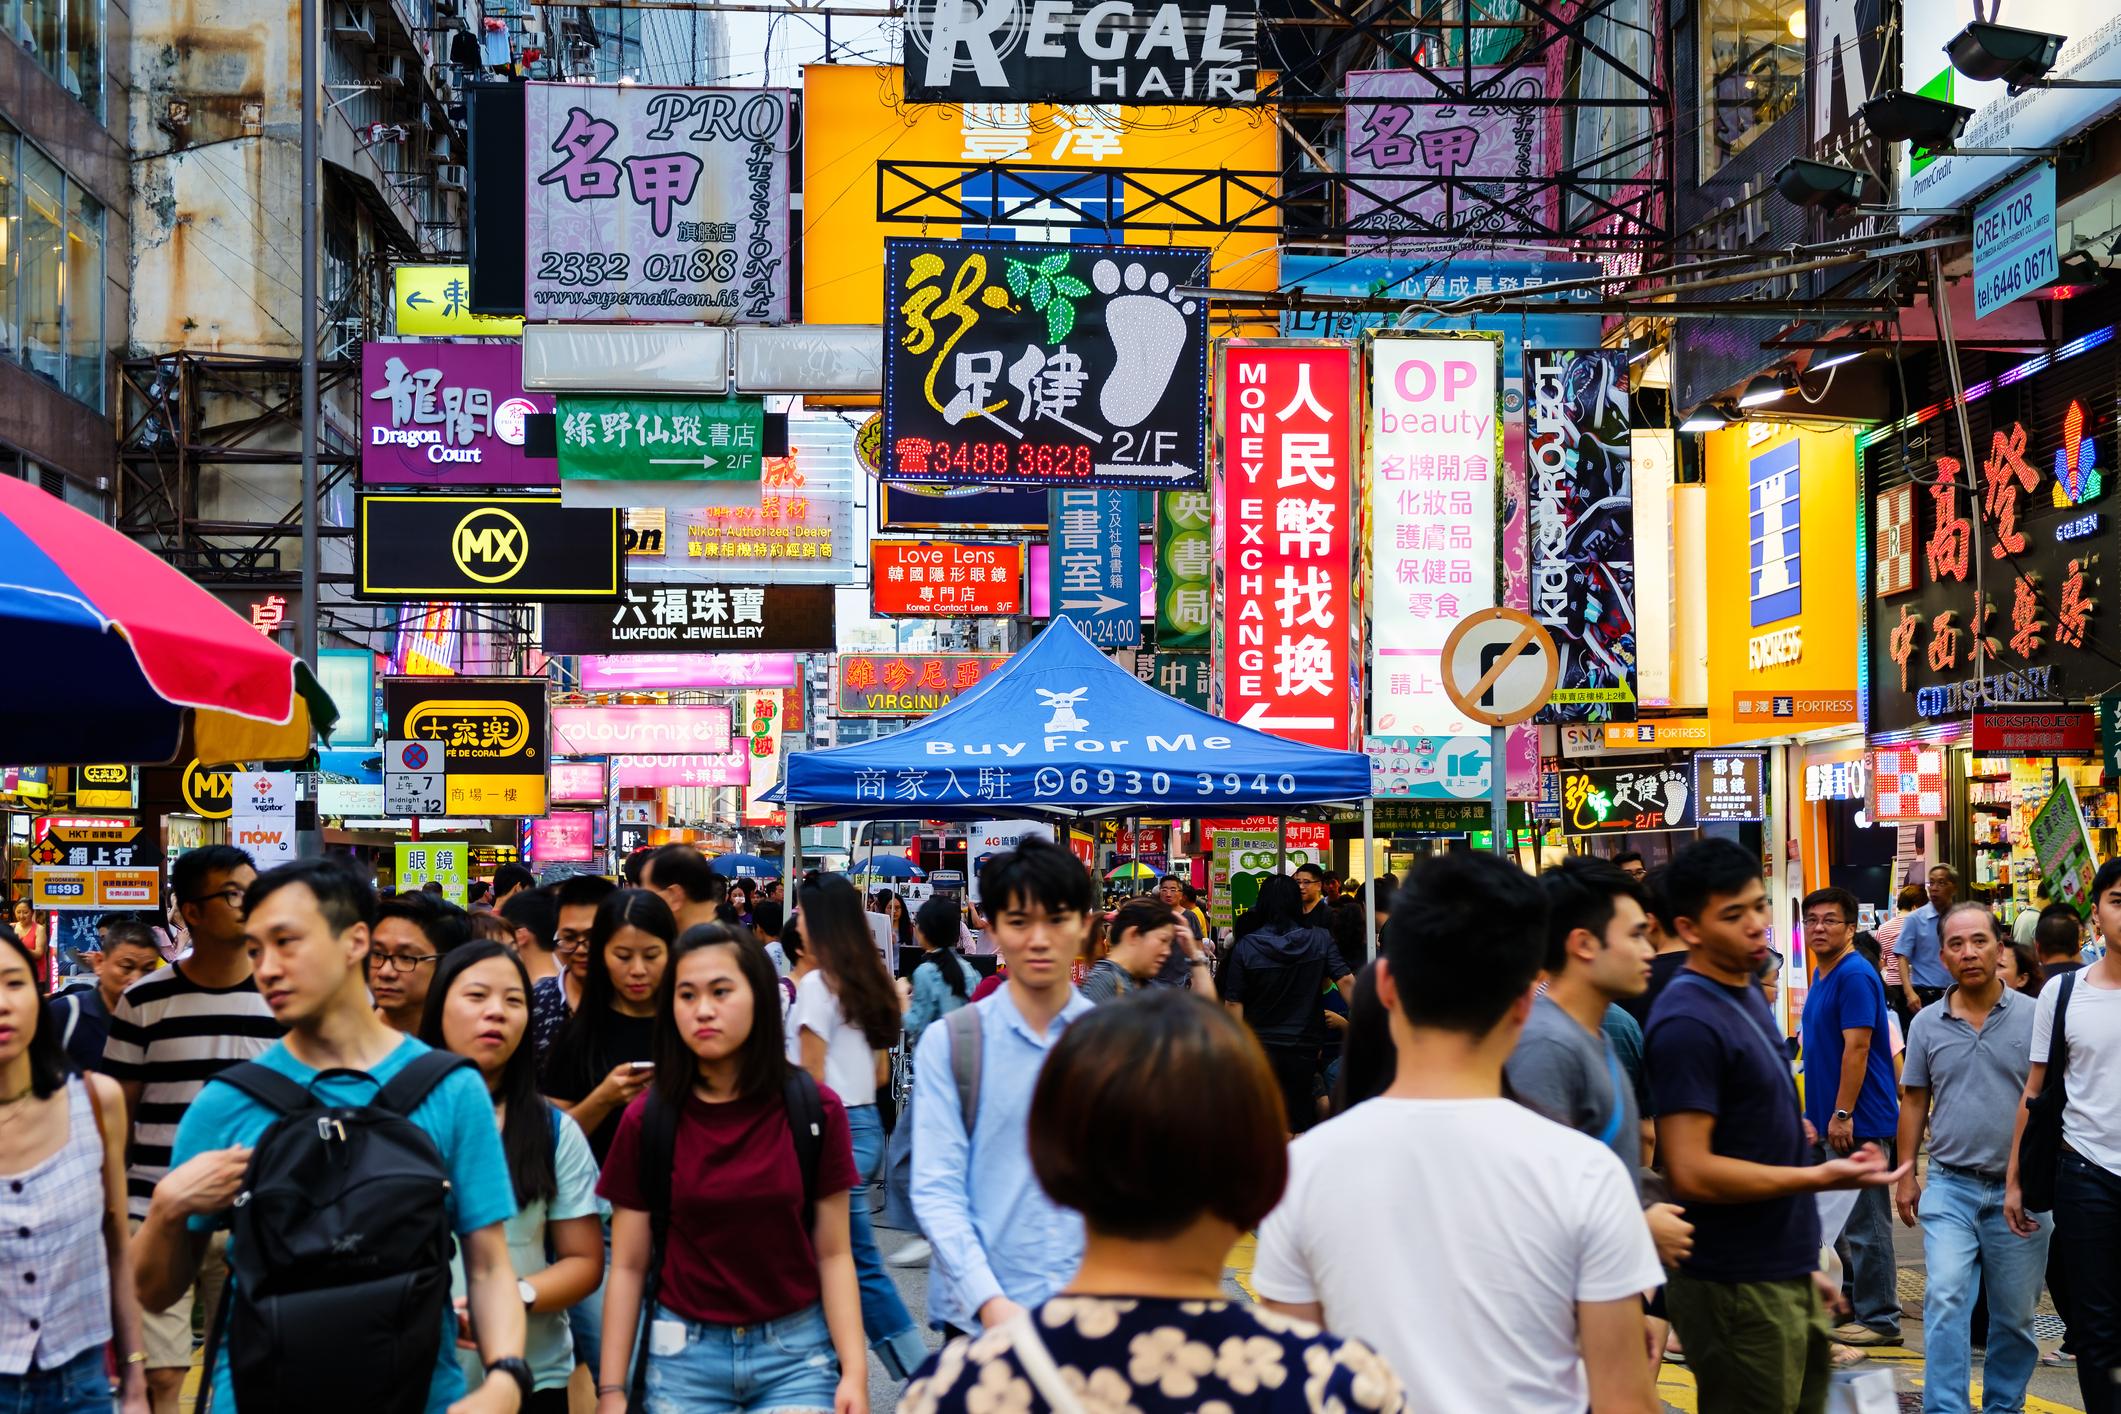 A street scene in Hong Kong.